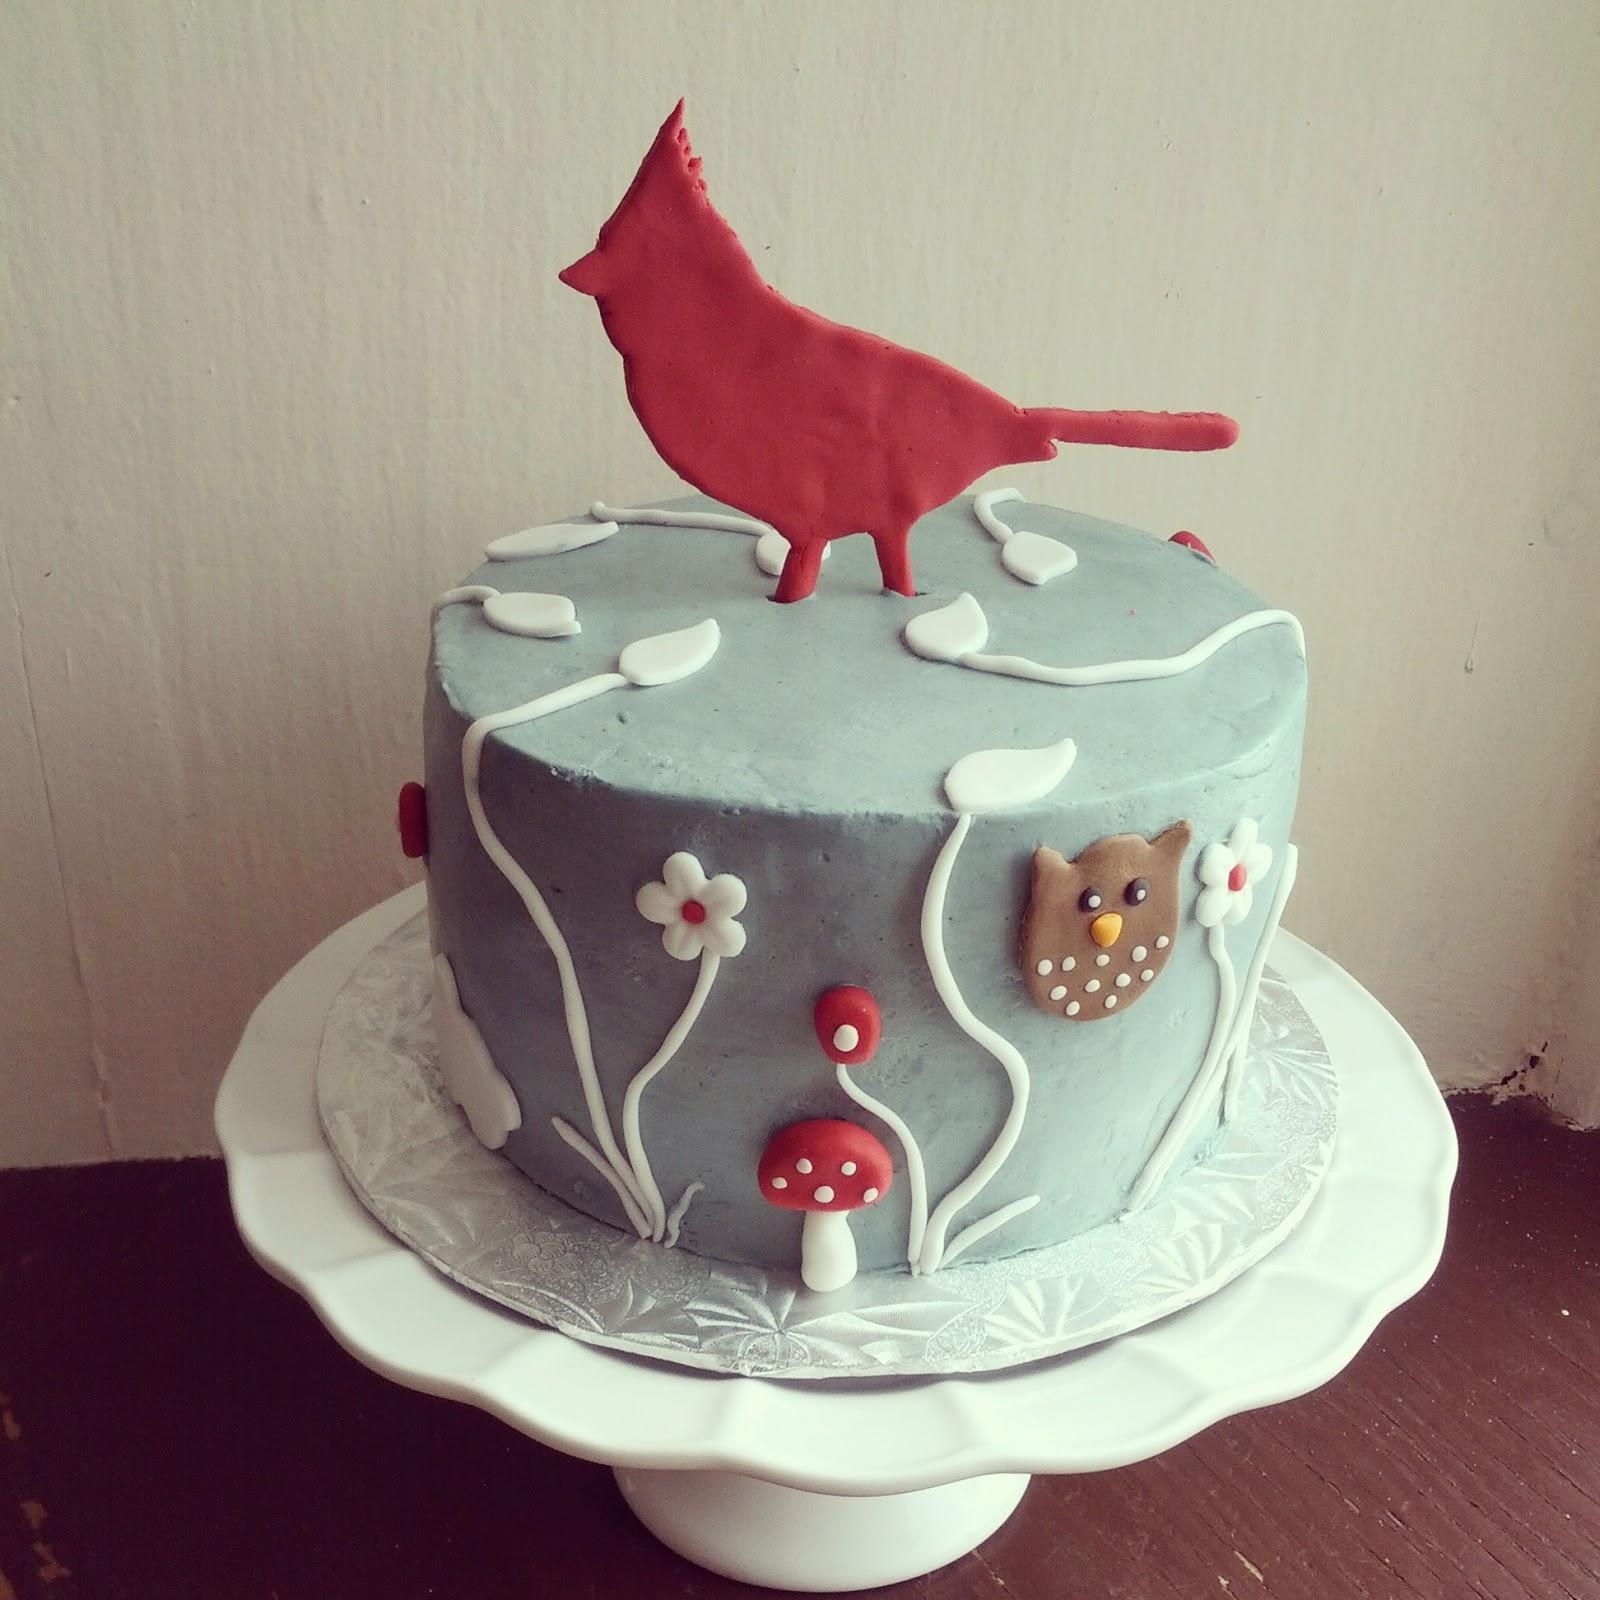 Second Generation Cake Design Red Cardinal Nature Birthday Cake